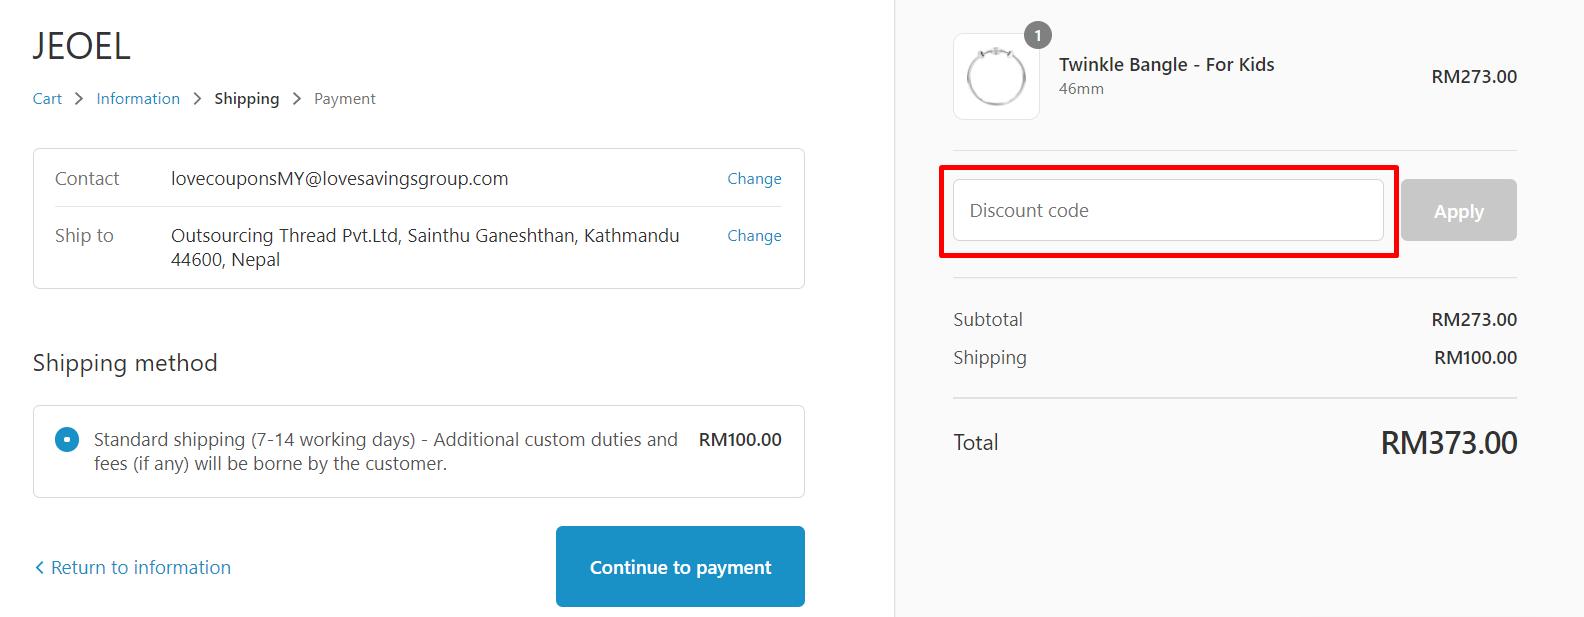 How do I use my JEOEL discount code?